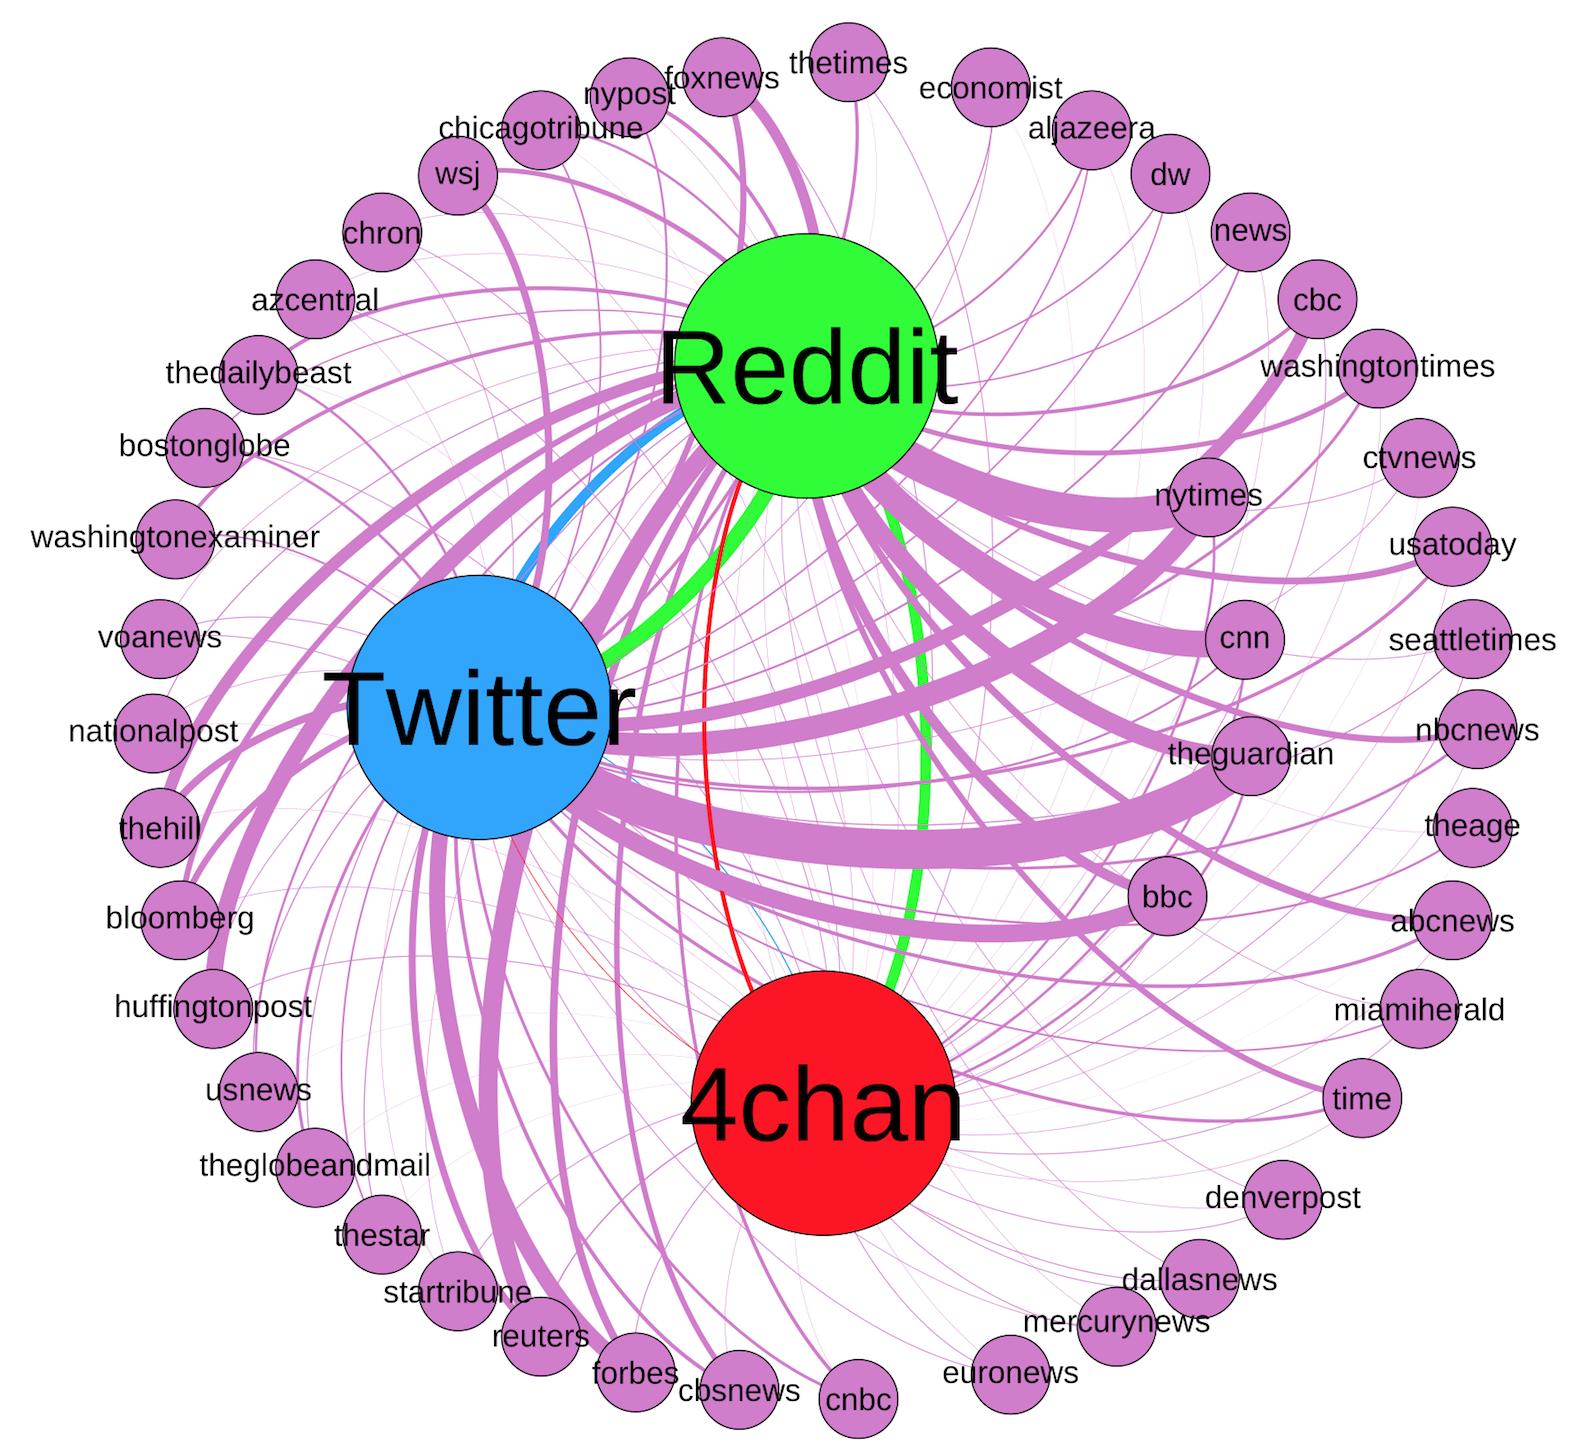 Graph for mainstream news domains